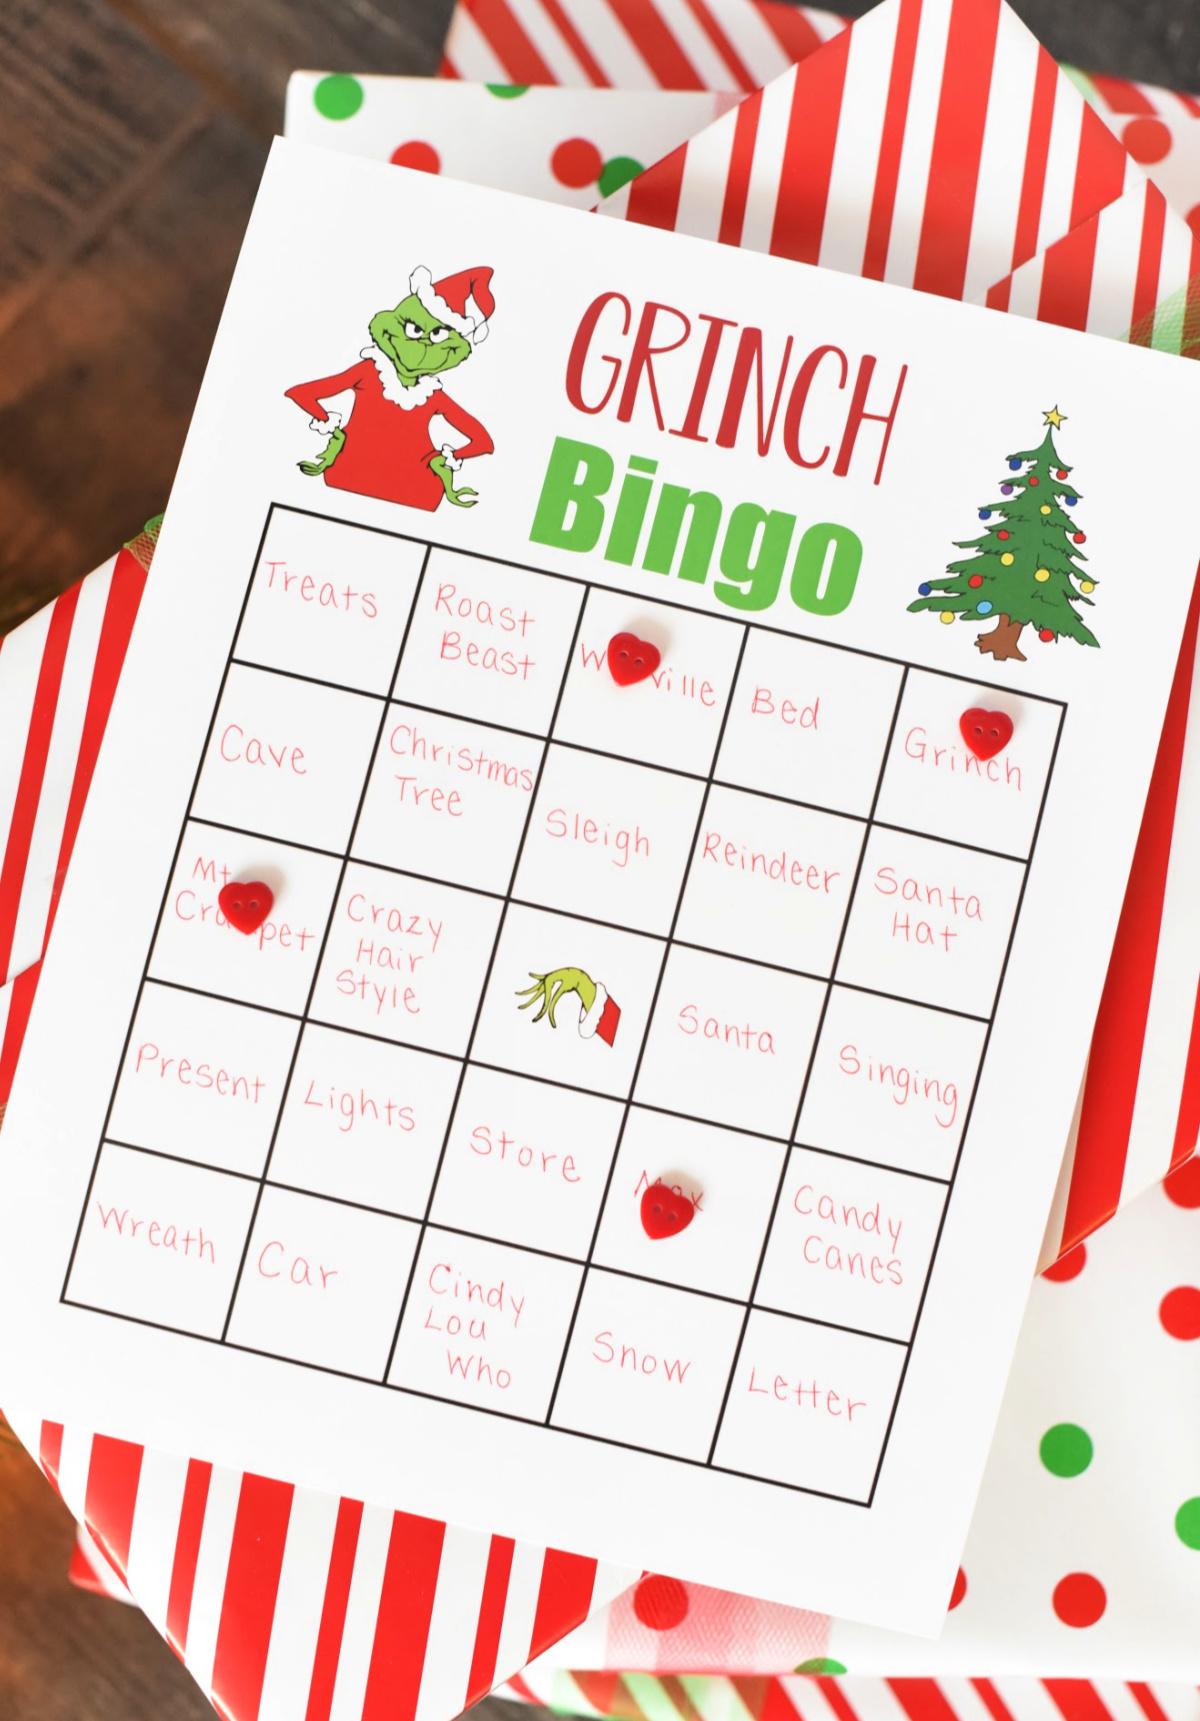 Fun Grinch Bingo